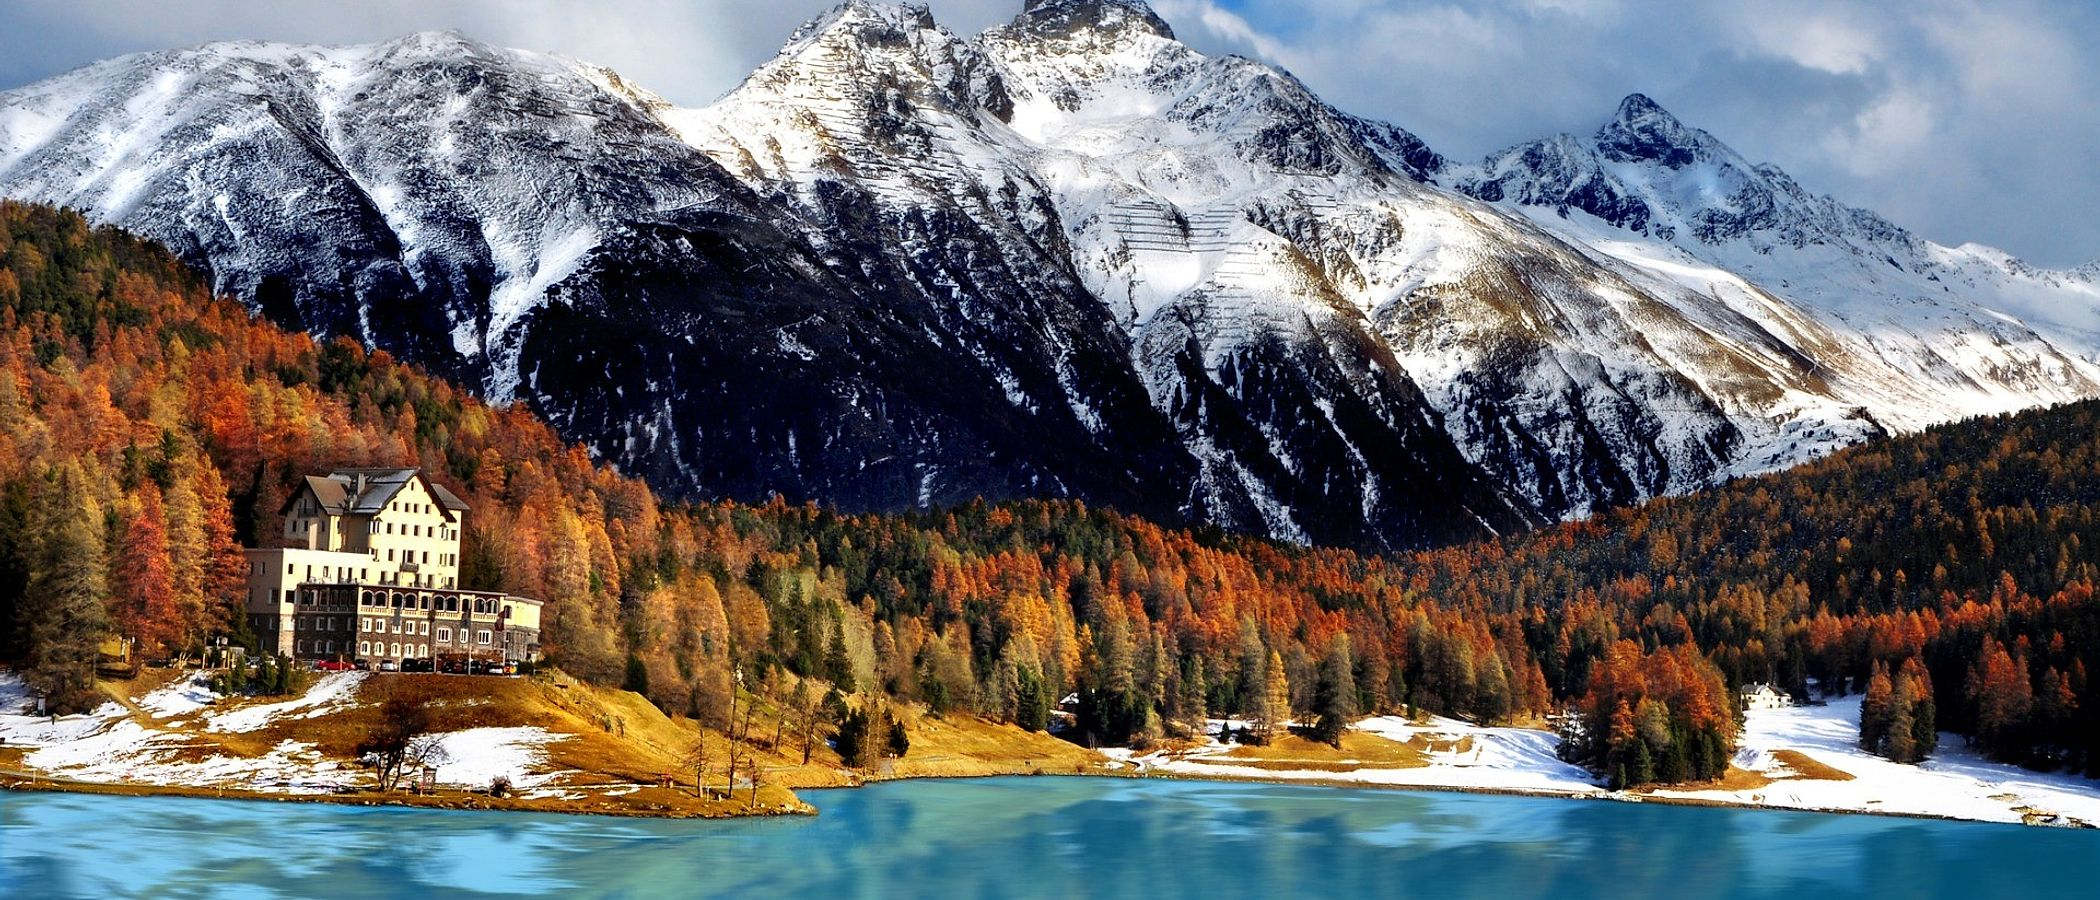 St. Moritz travel packages